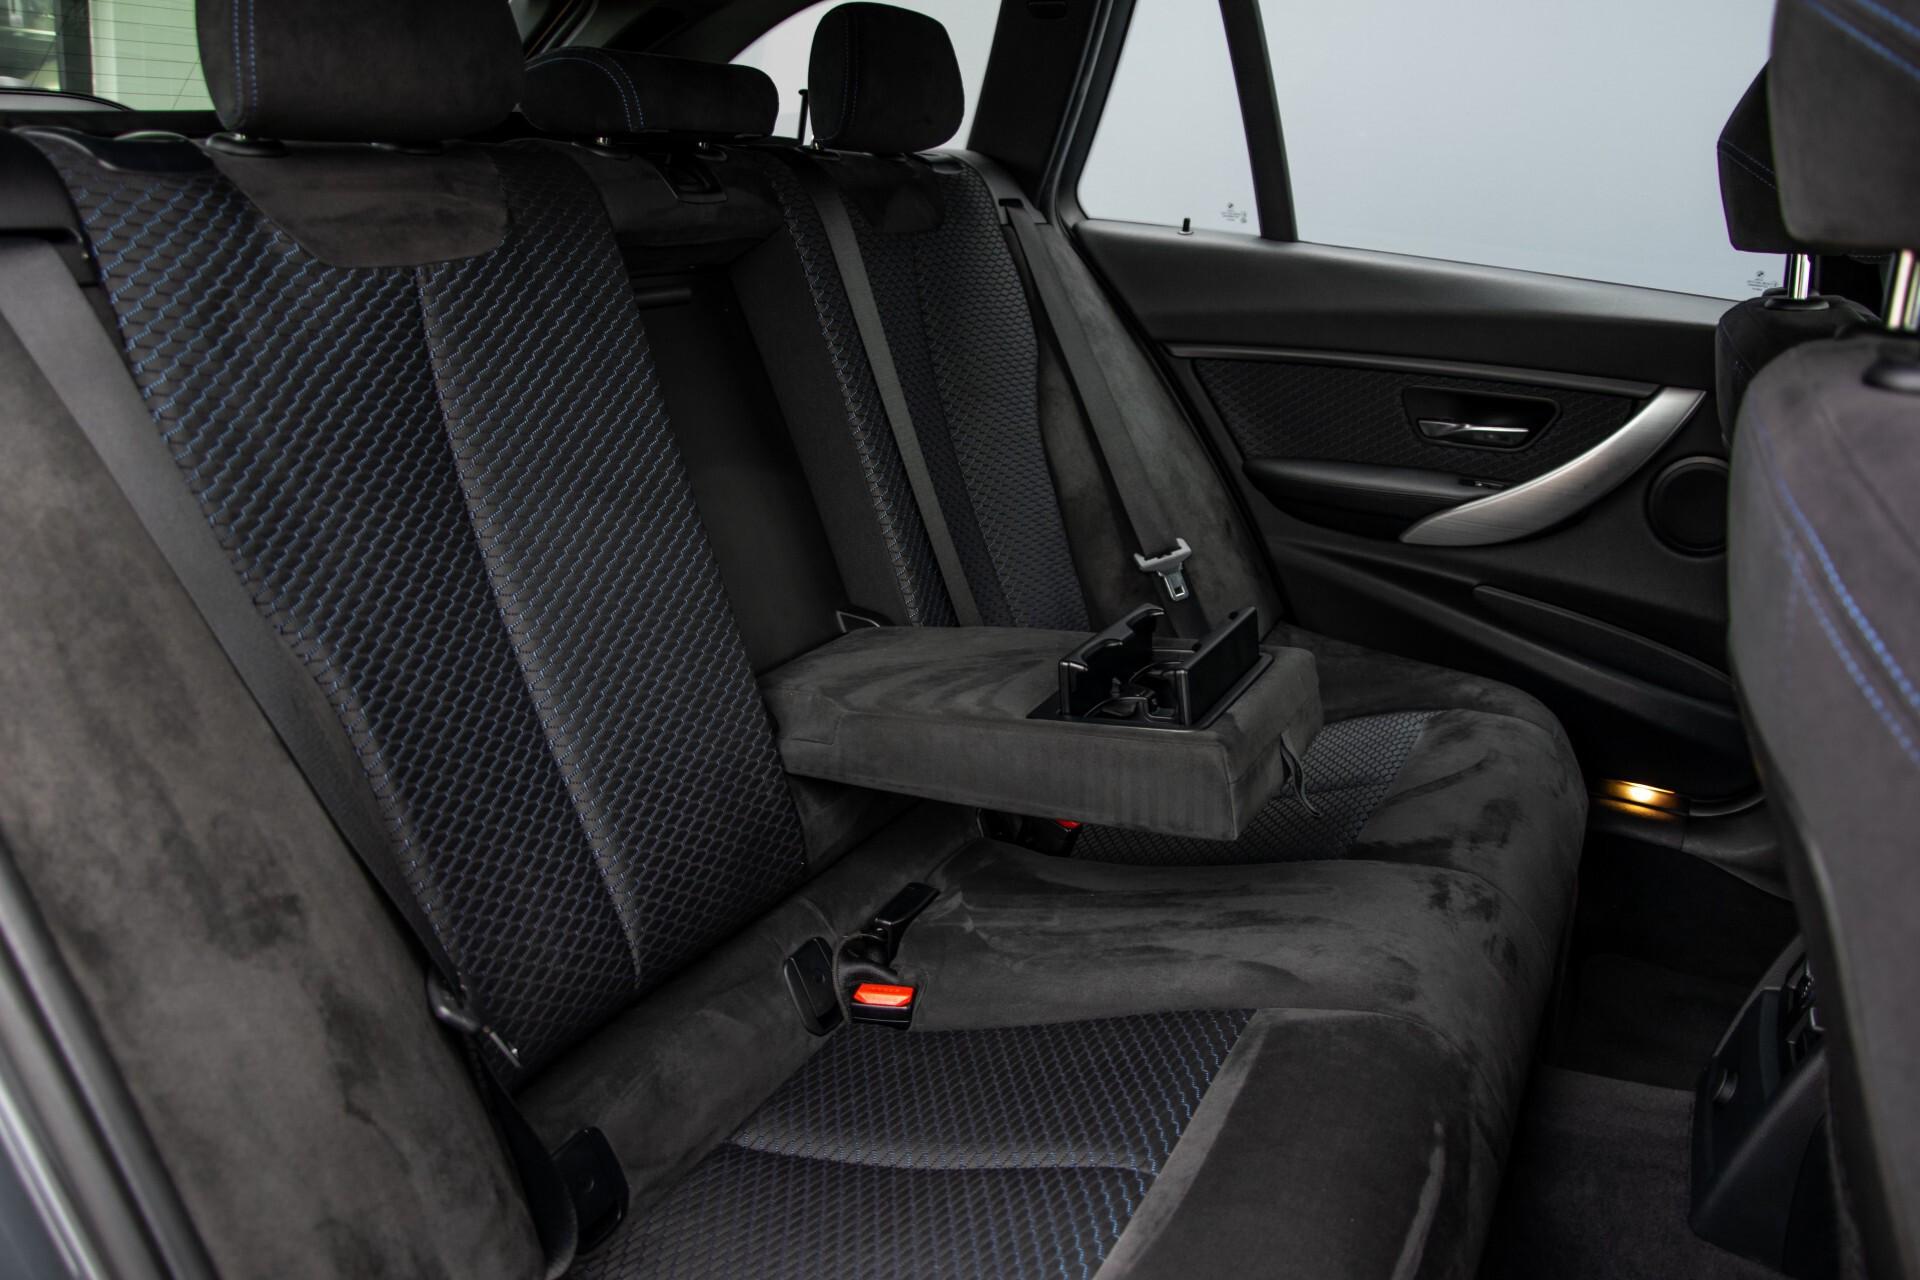 BMW 3 Serie Touring 316i M-Sportpakket Executive NL Auto/NAP Aut8 Foto 5